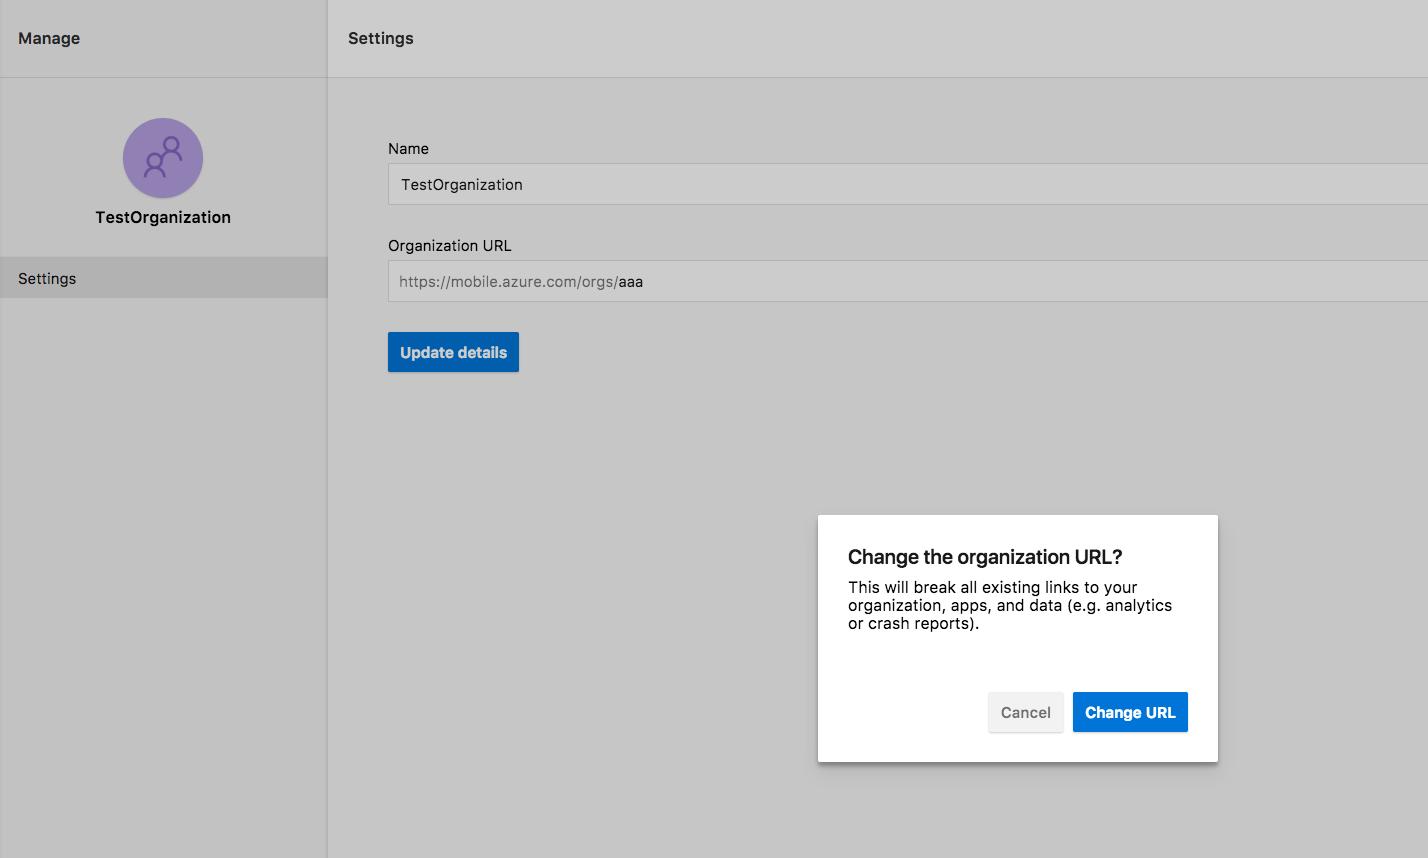 vsmc_manage_change_url